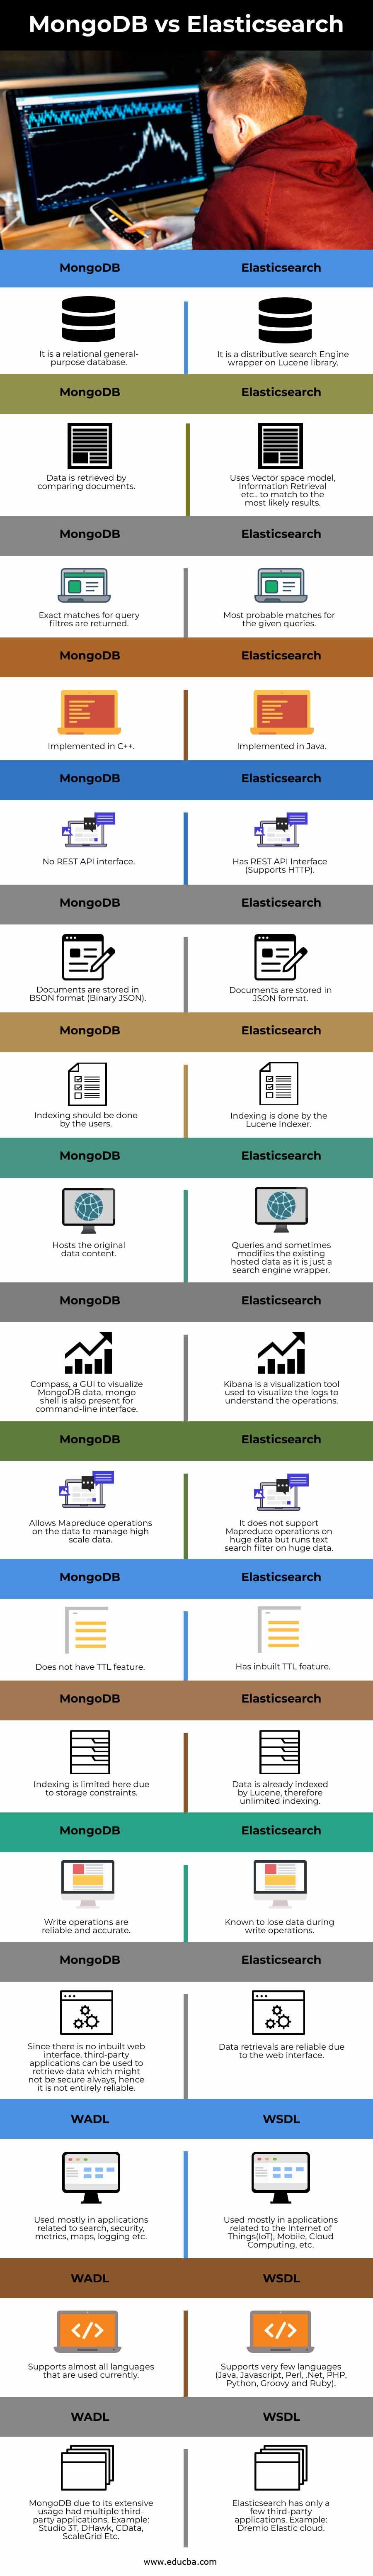 MongoDB vs Elasticsearch info